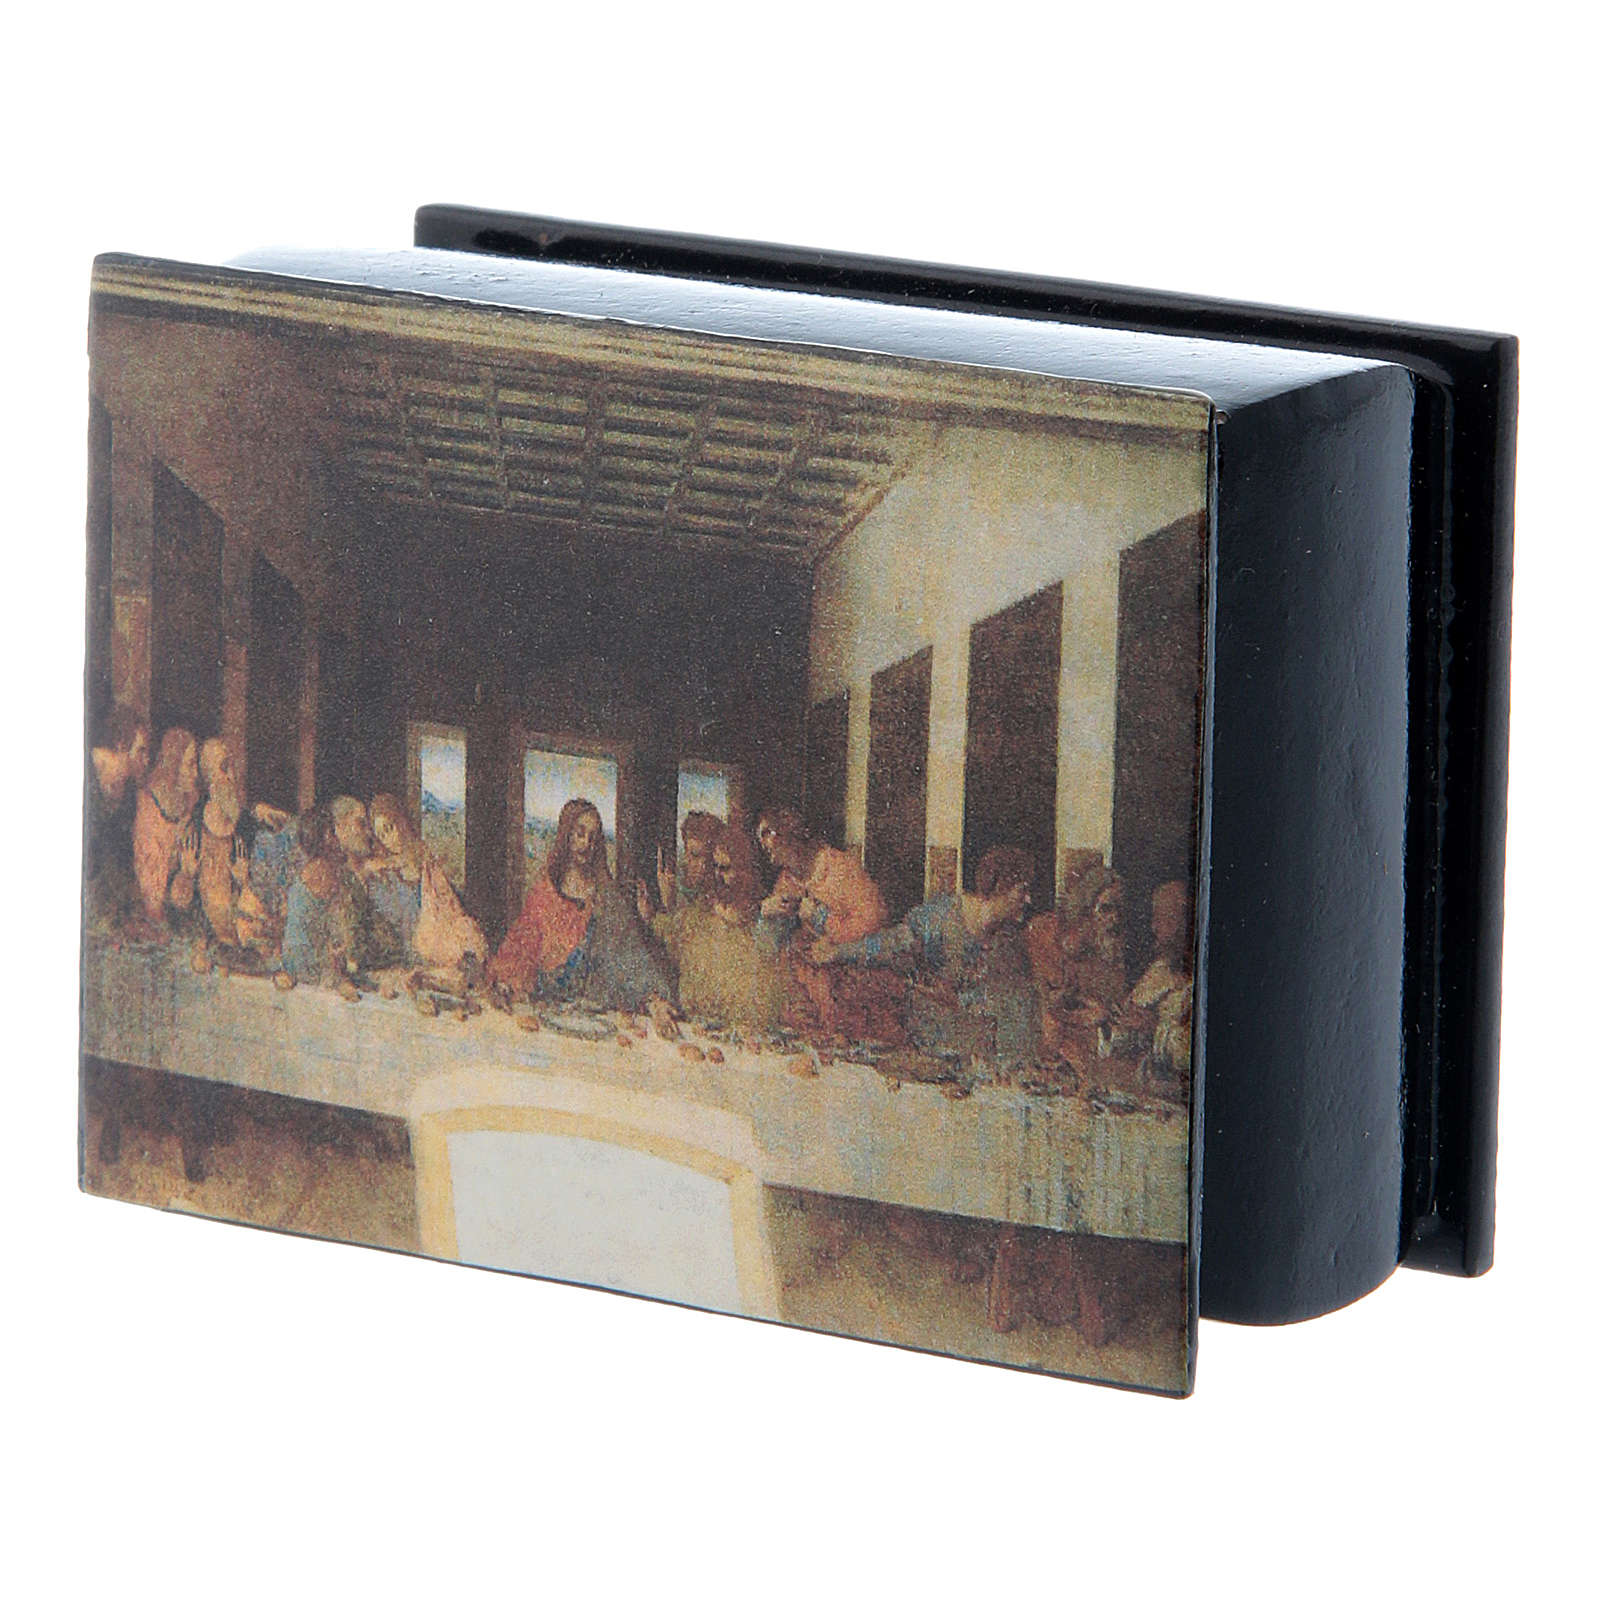 Caja rusa decorada papier machè Última Cena 7x5 cm 4